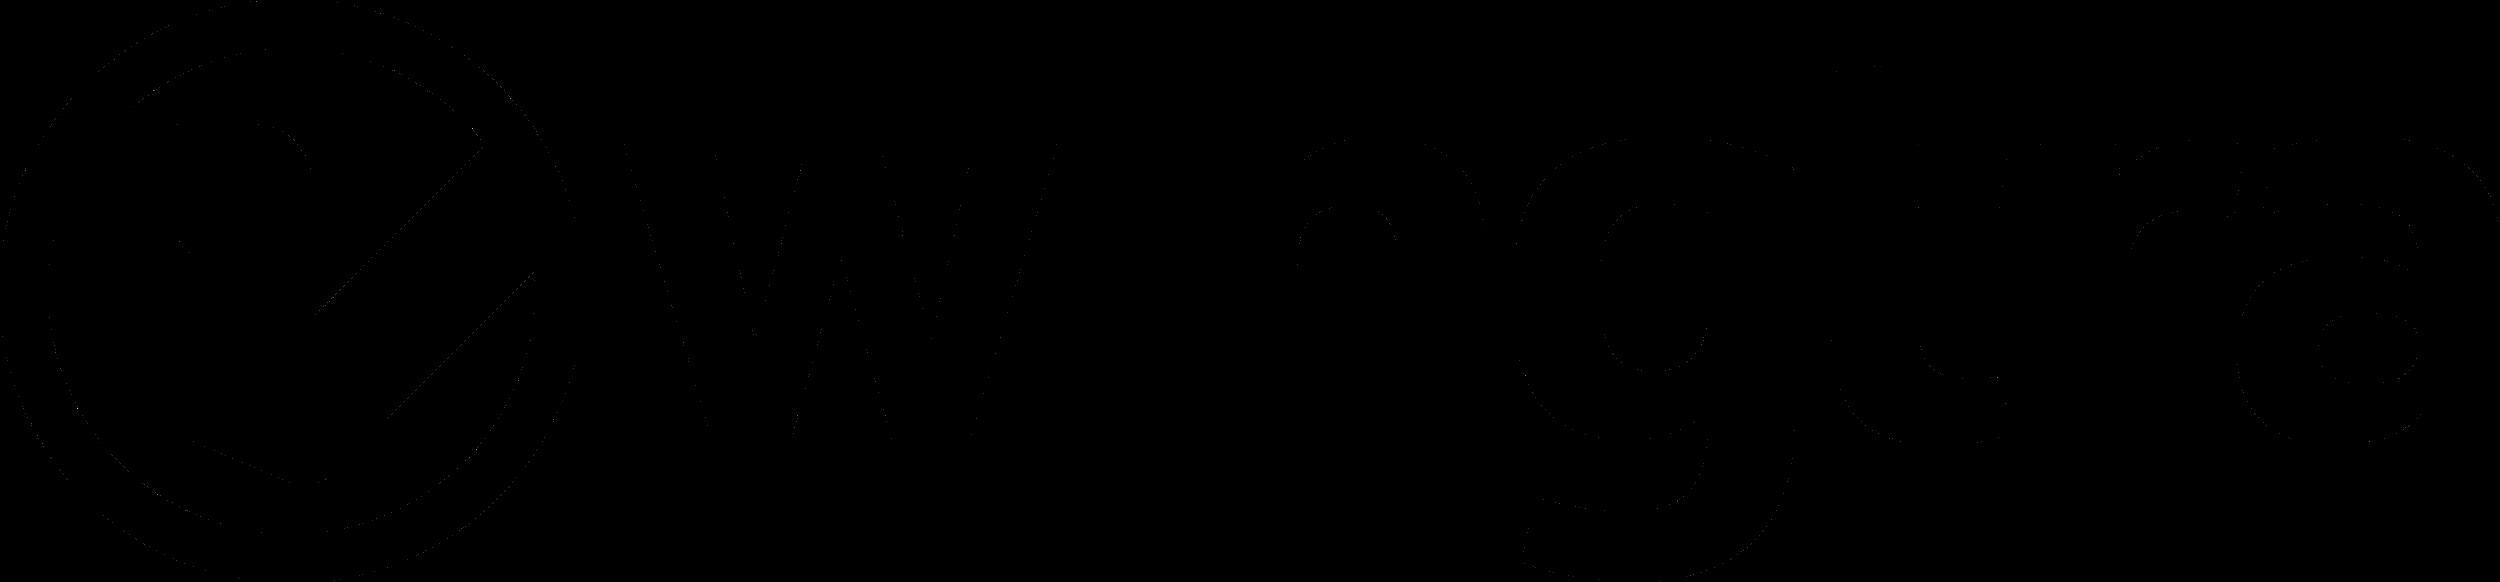 wingtra